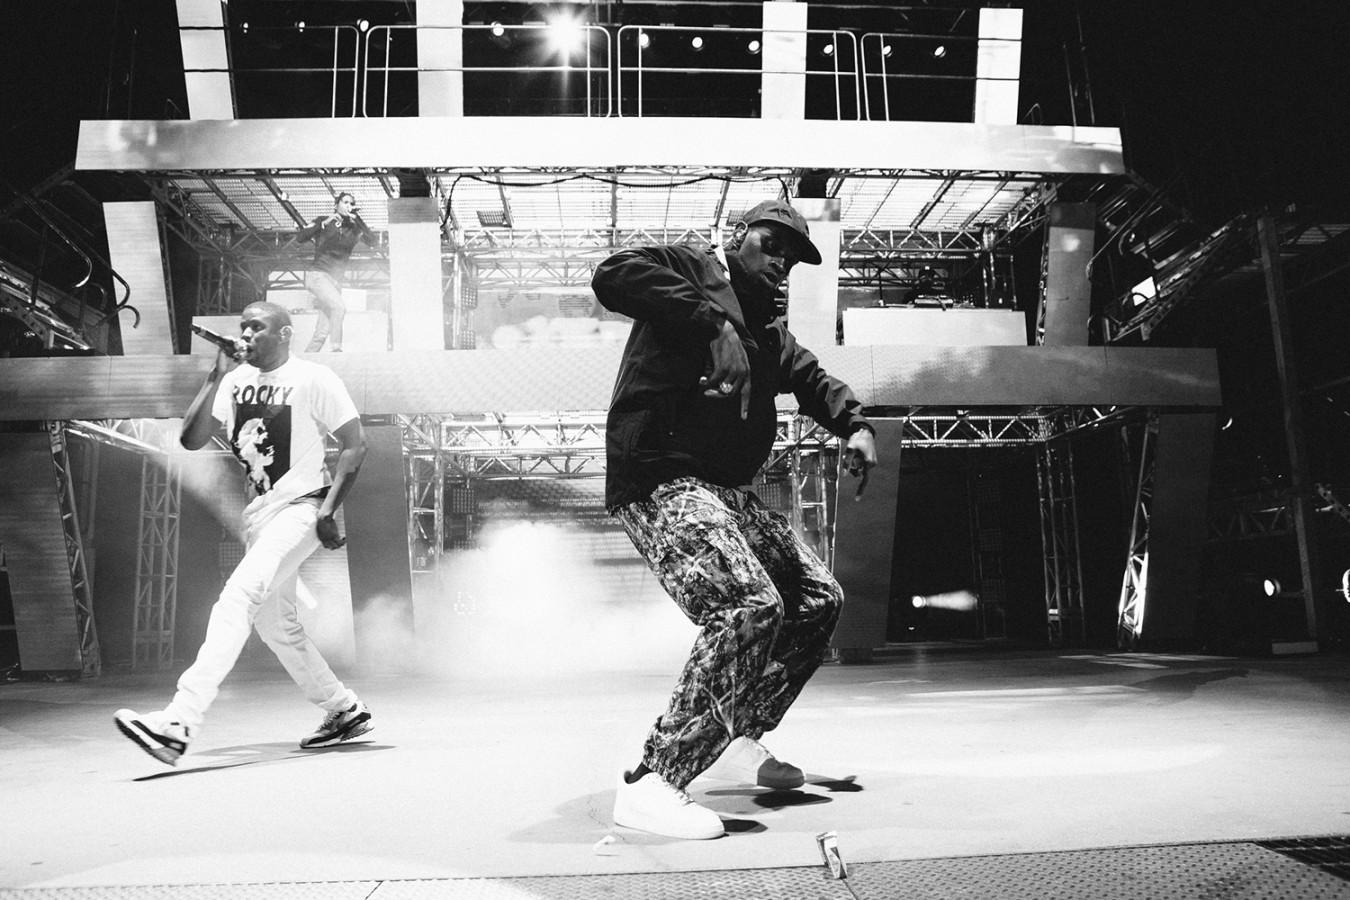 asap-rocky-tyler-the-creator-tour-backstage-33-1350x900